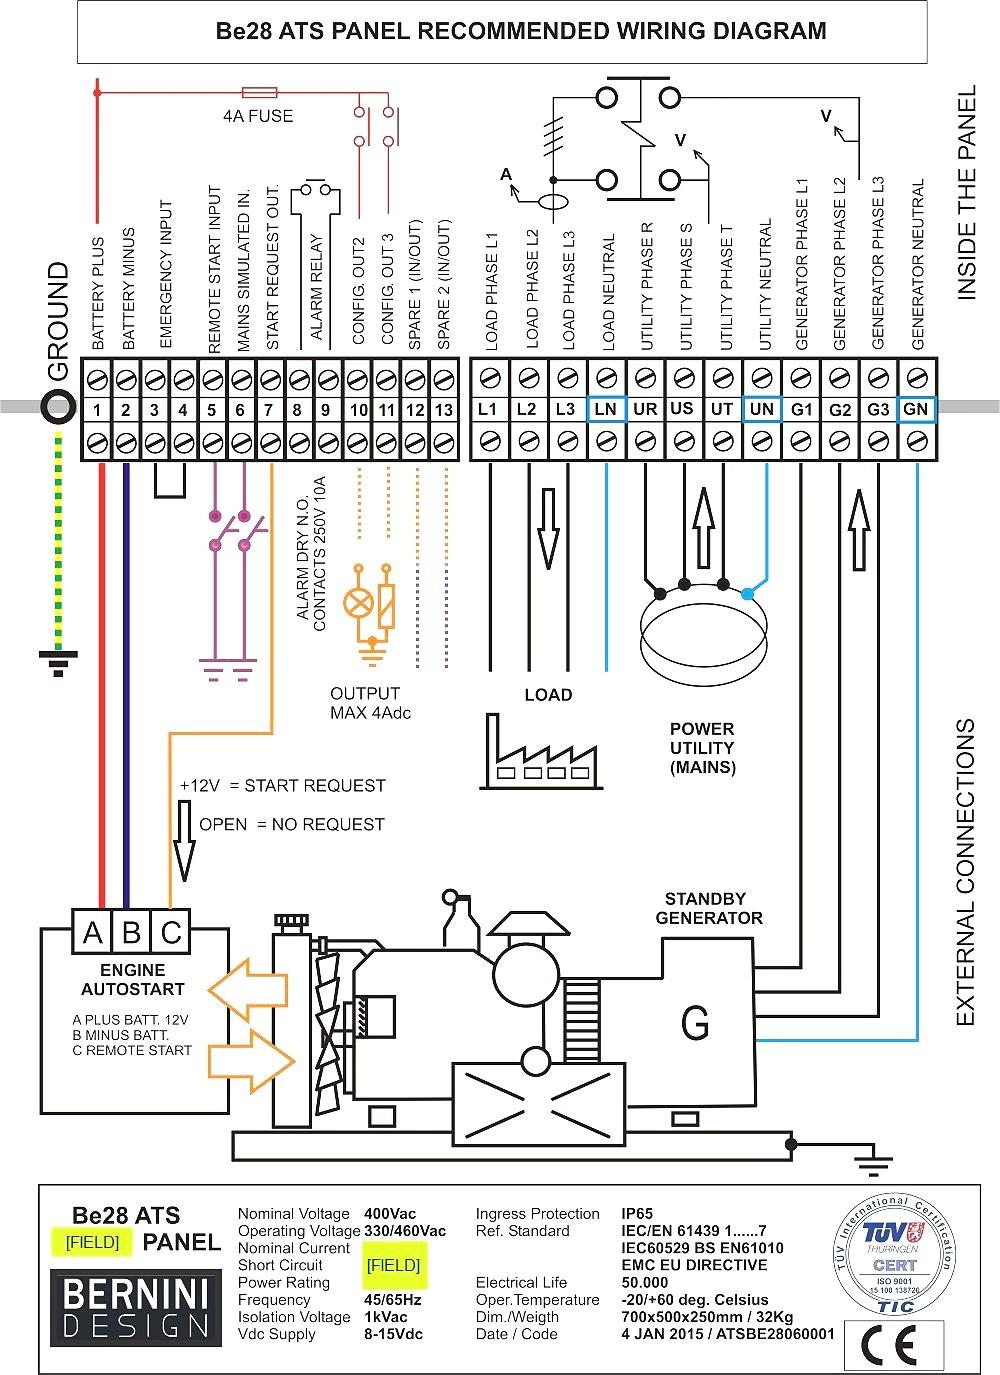 Generac Generator Wiring Diagram